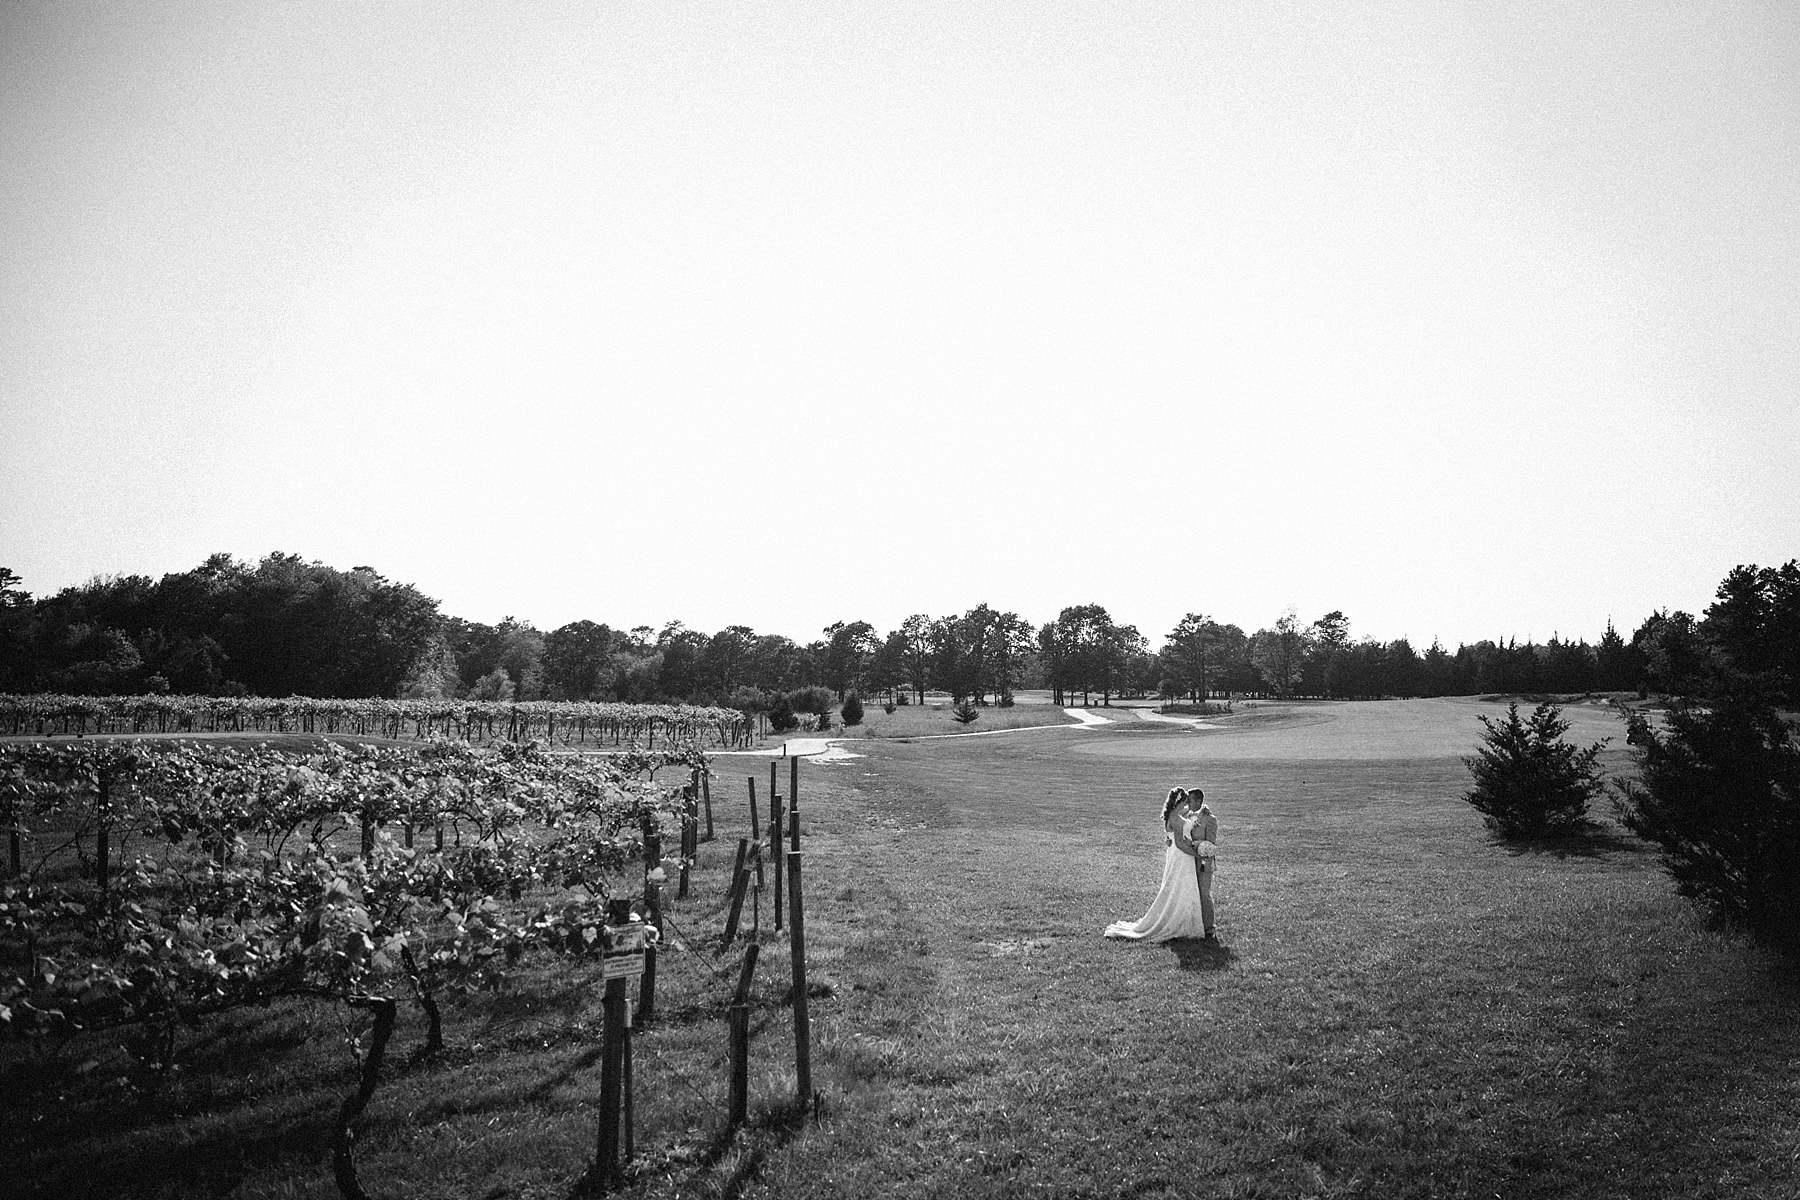 farm-wedding-engagement-session-destination-intimate_0036.jpg